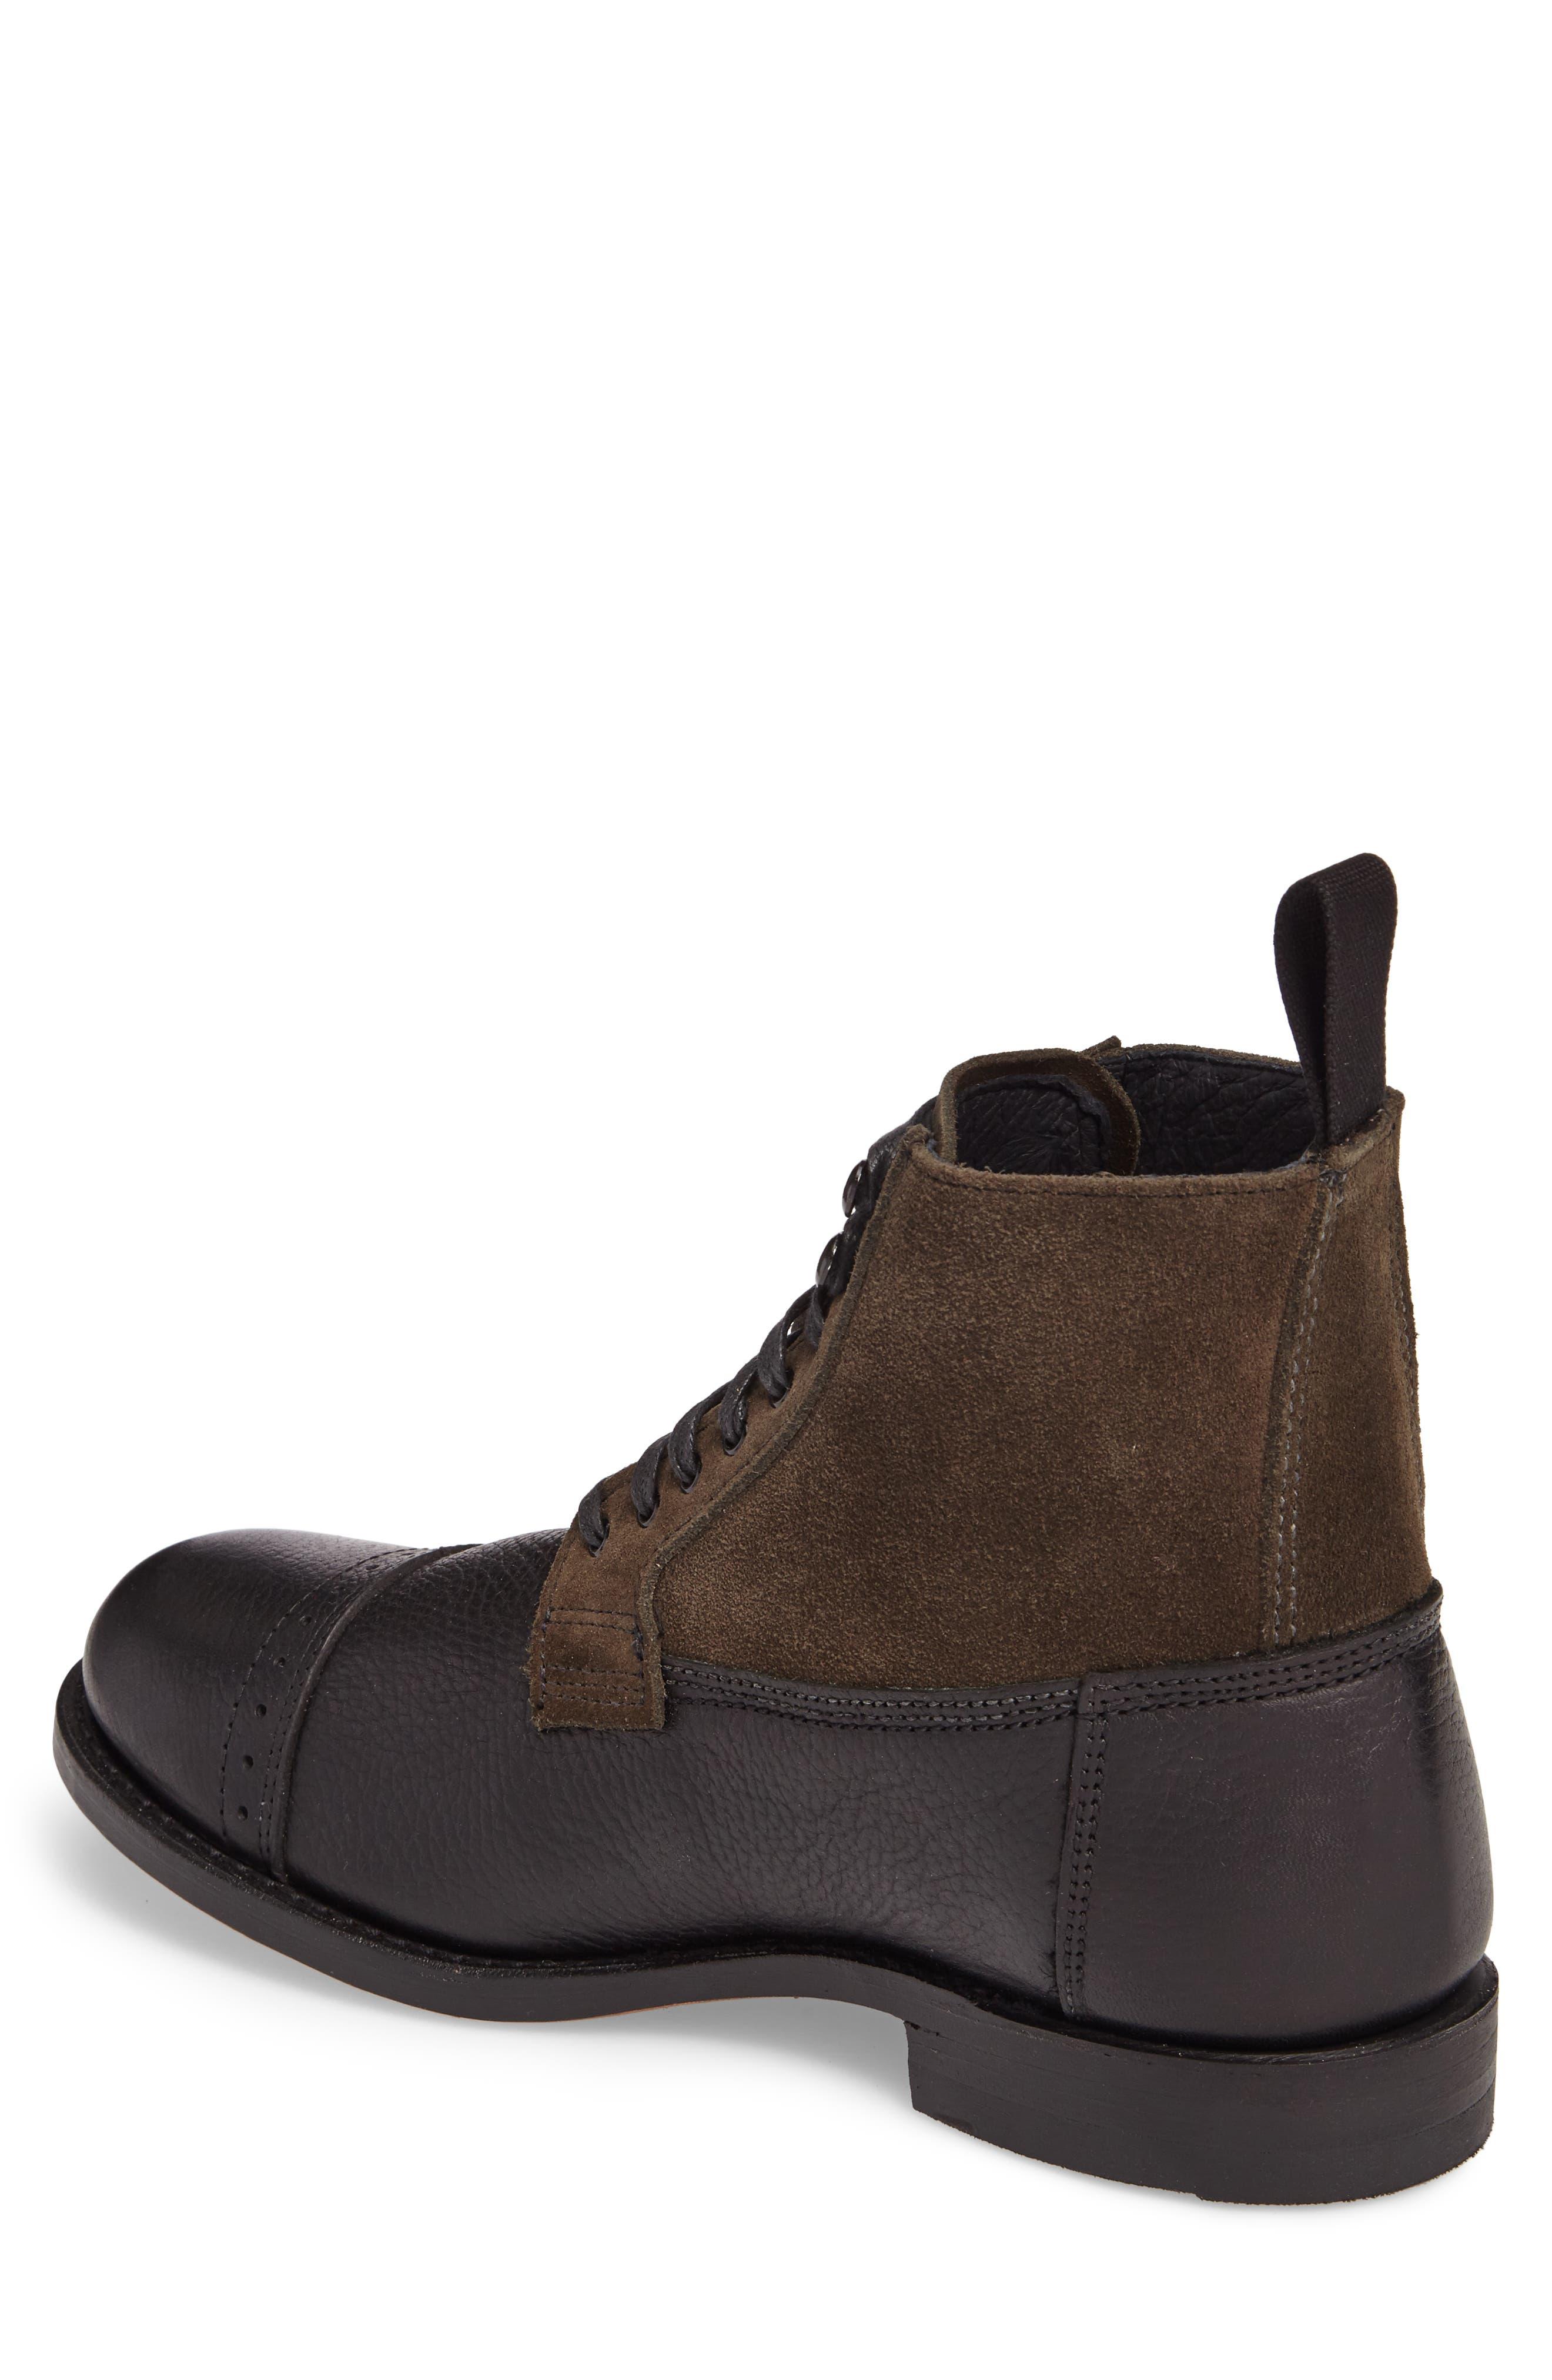 Frey Garrison Cap Toe Boot,                             Alternate thumbnail 2, color,                             010